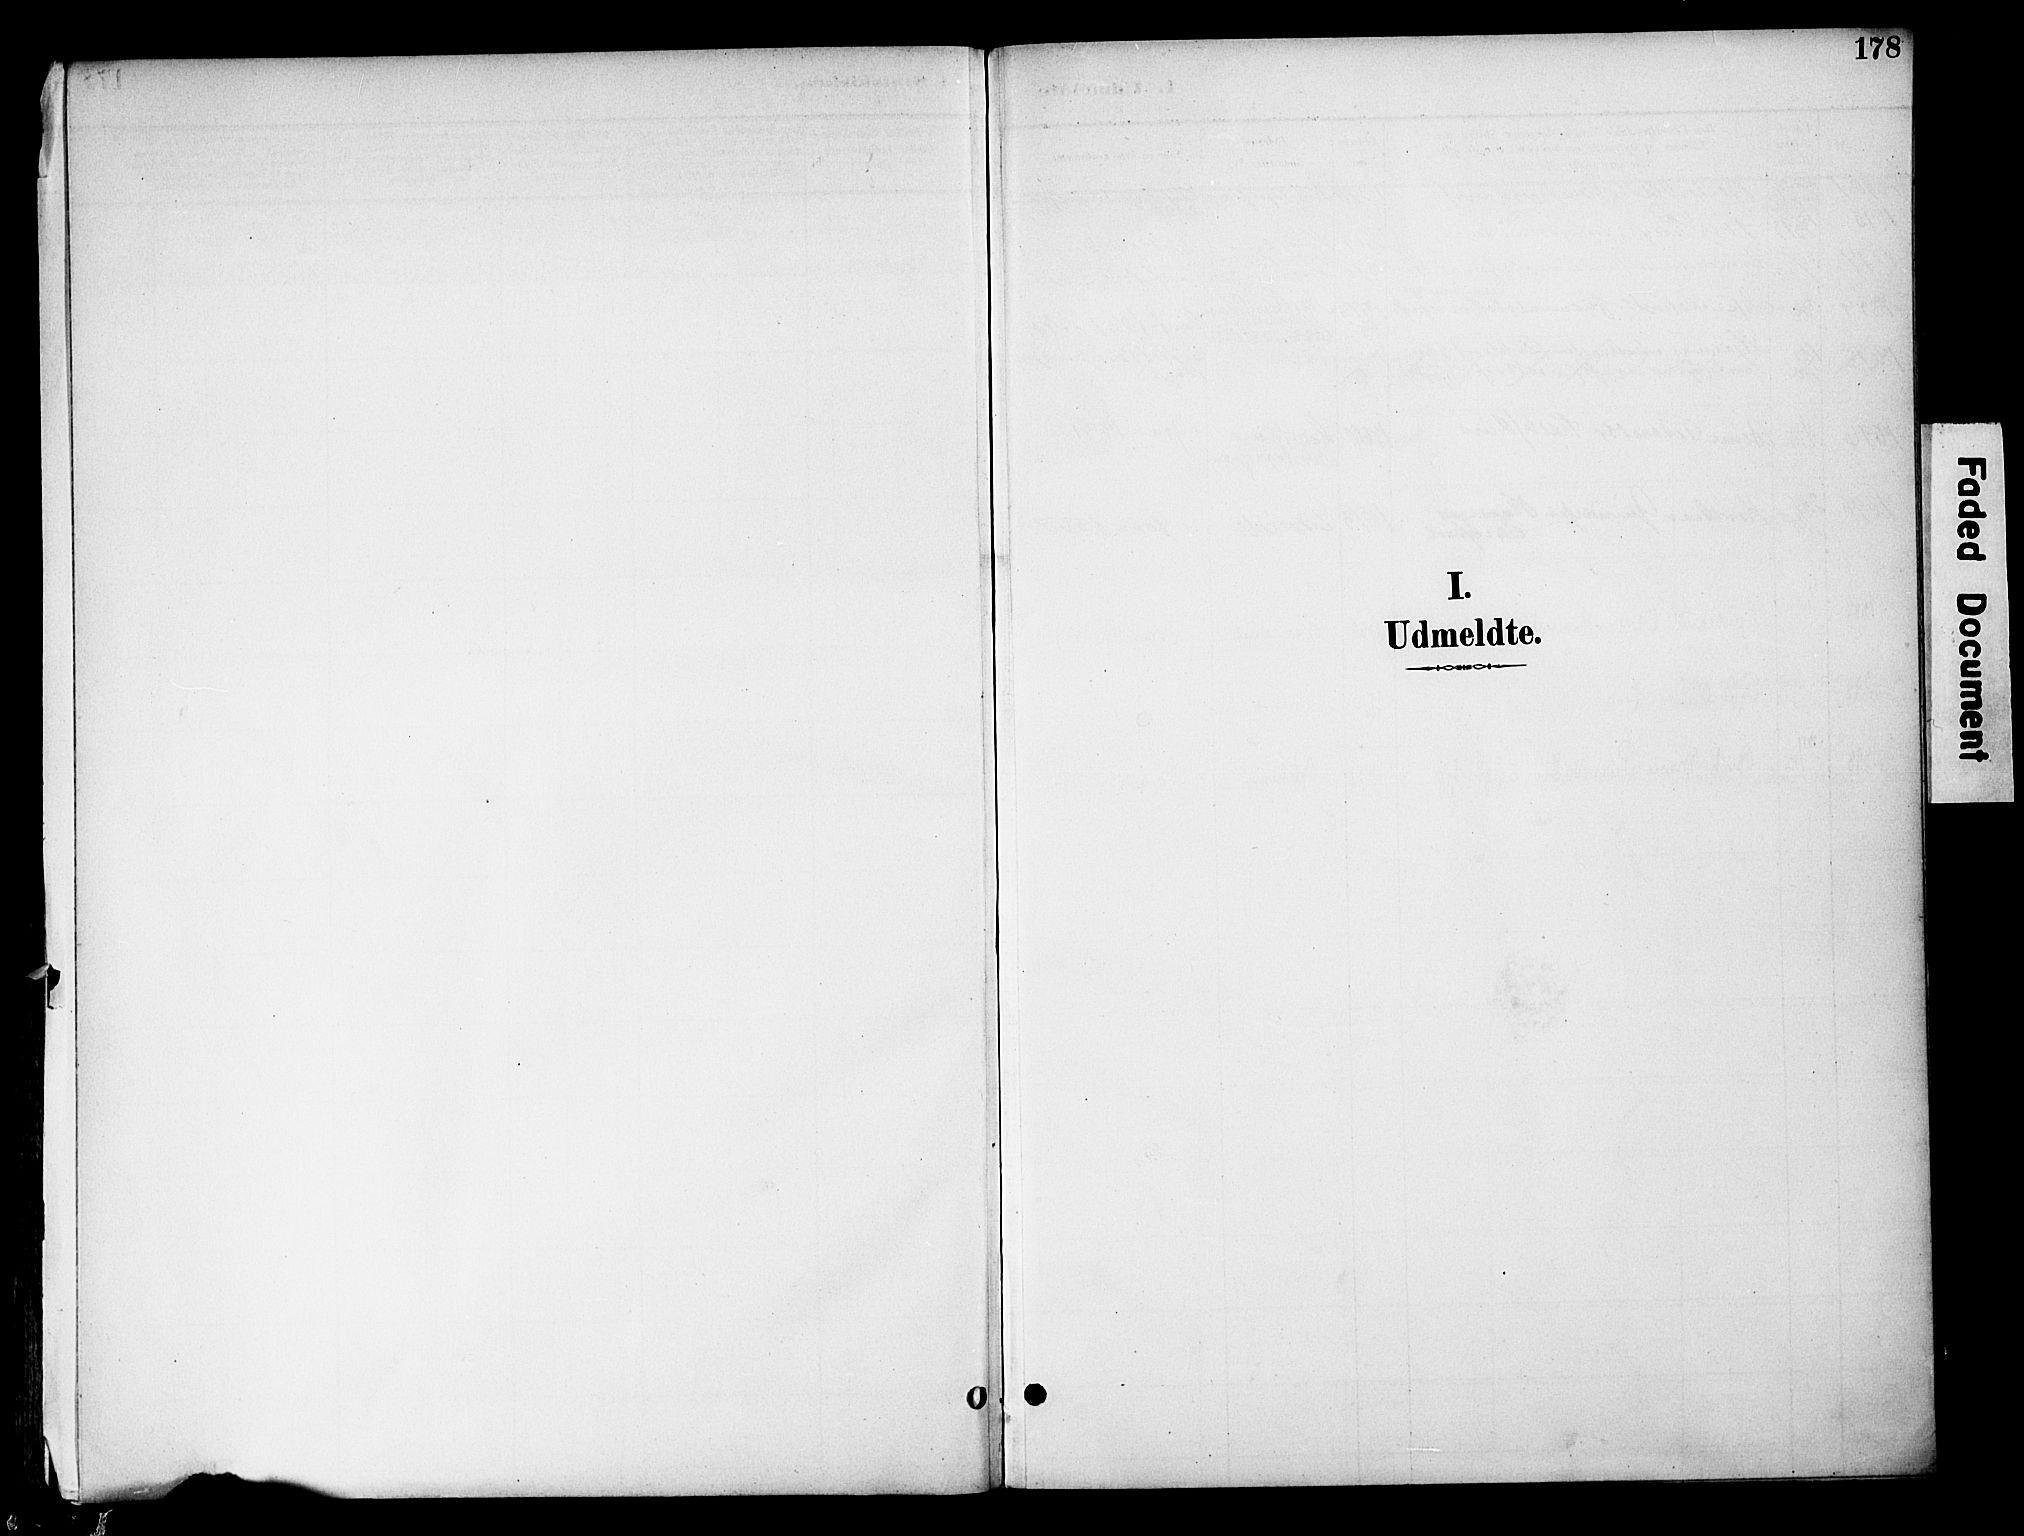 SAH, Gran prestekontor, Ministerialbok nr. 20, 1889-1899, s. 178